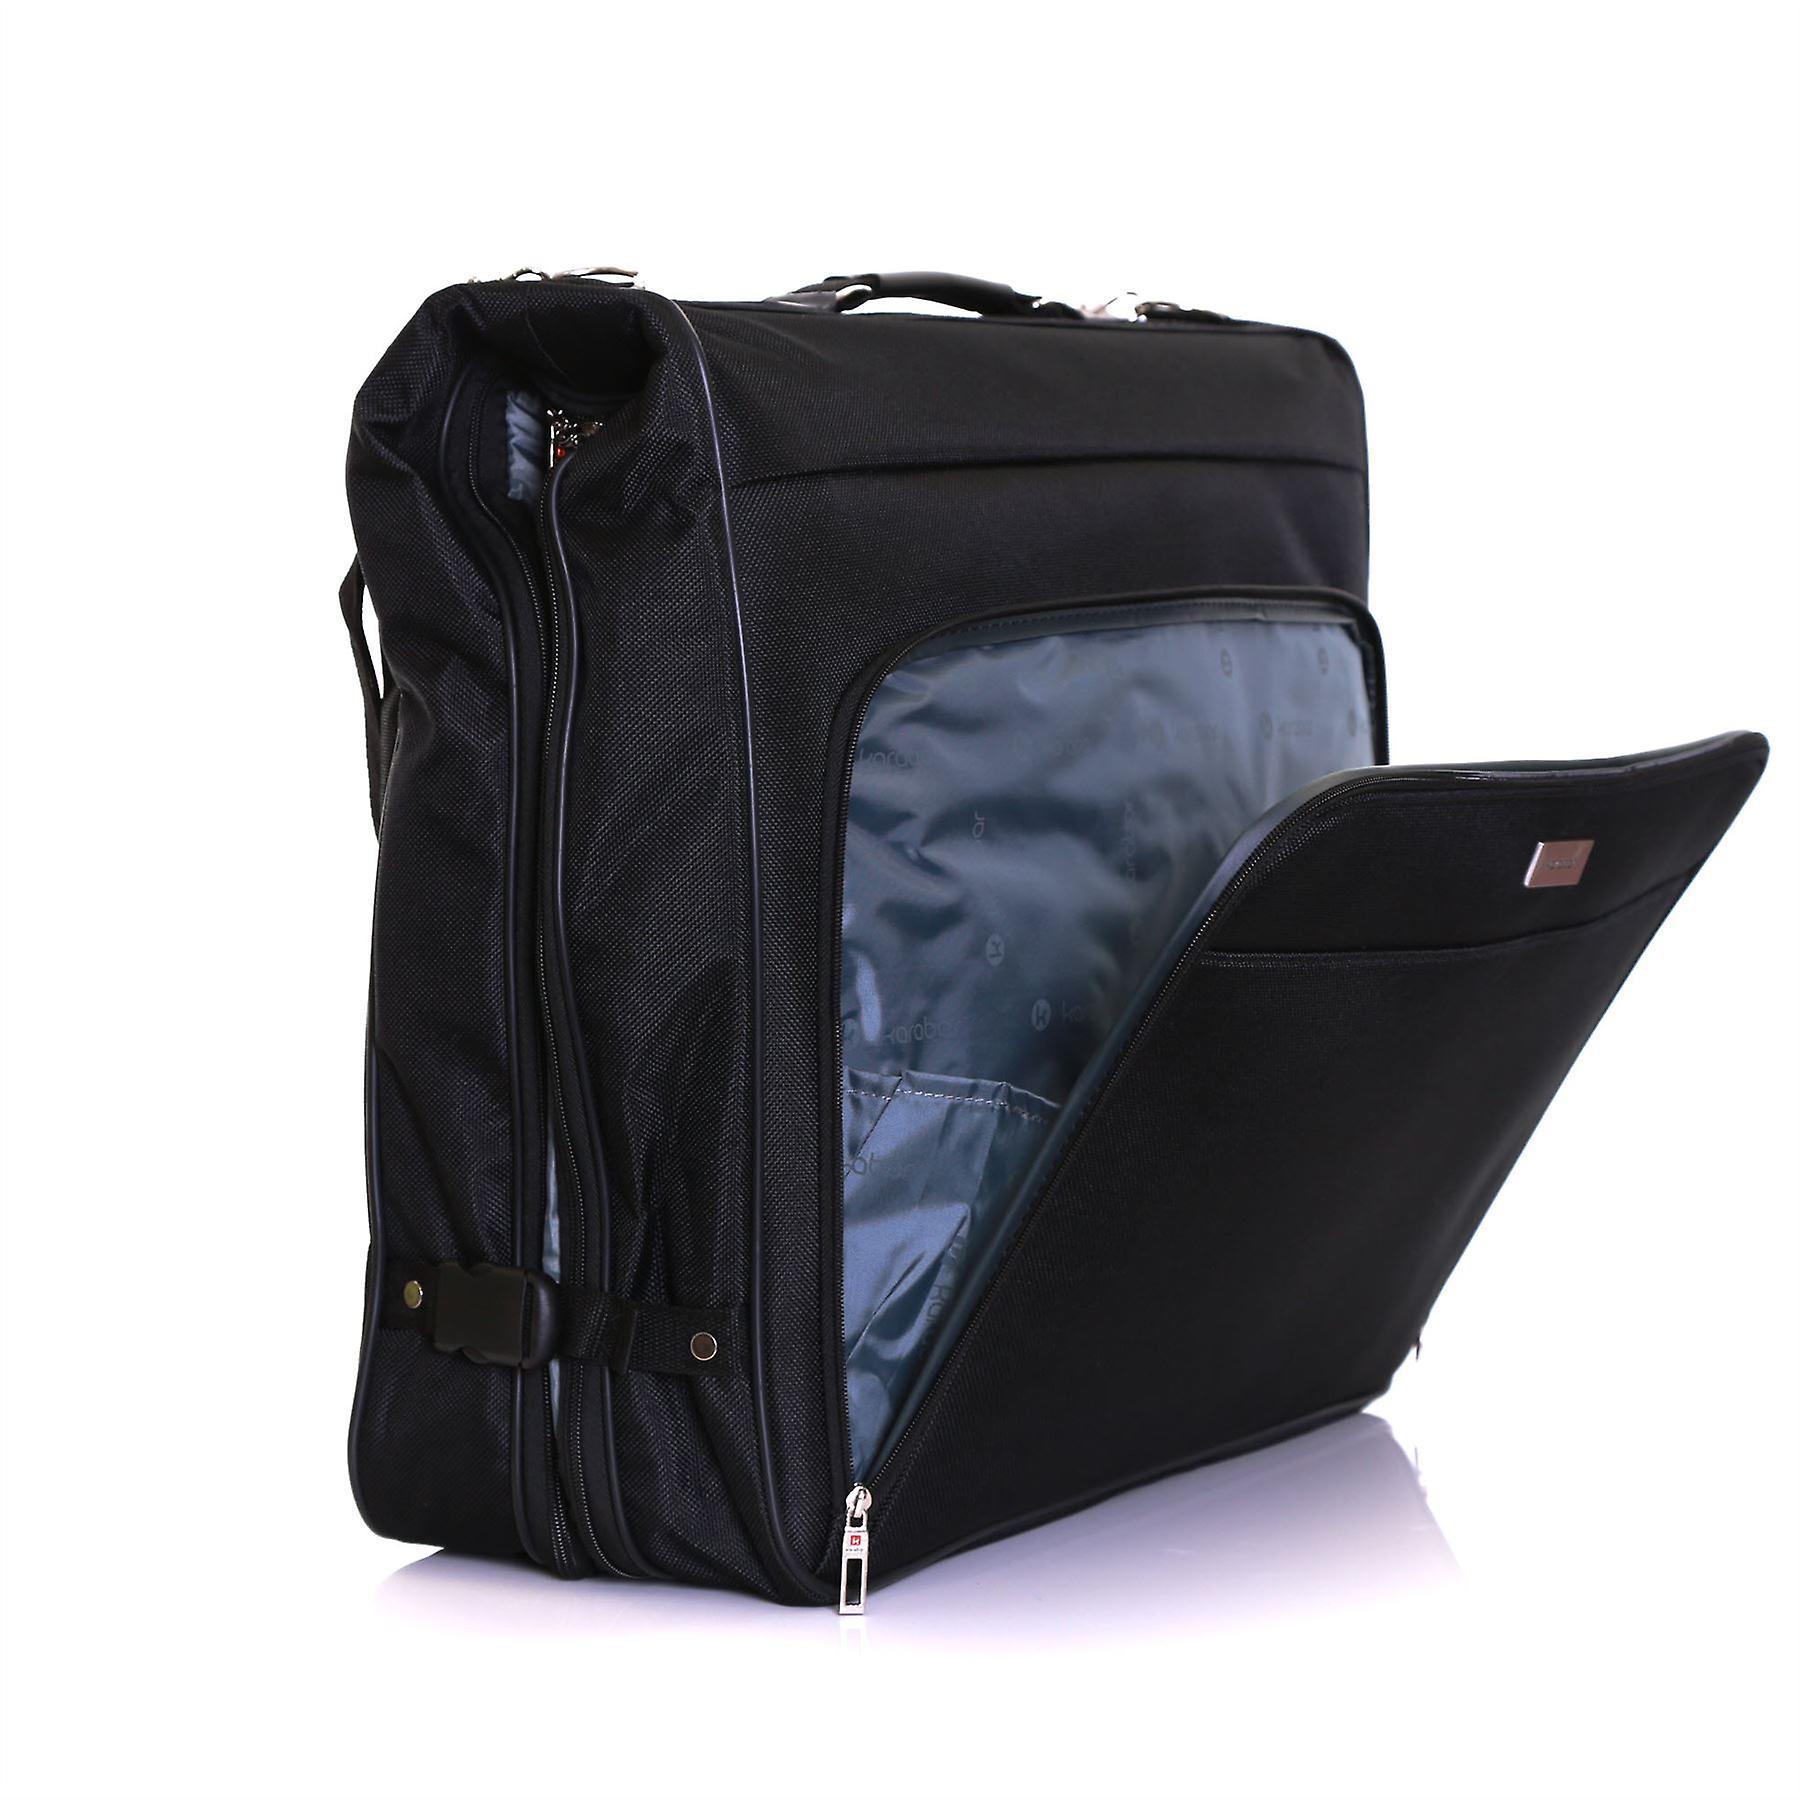 Karabar Potton Suit/Garment Carrier, Black